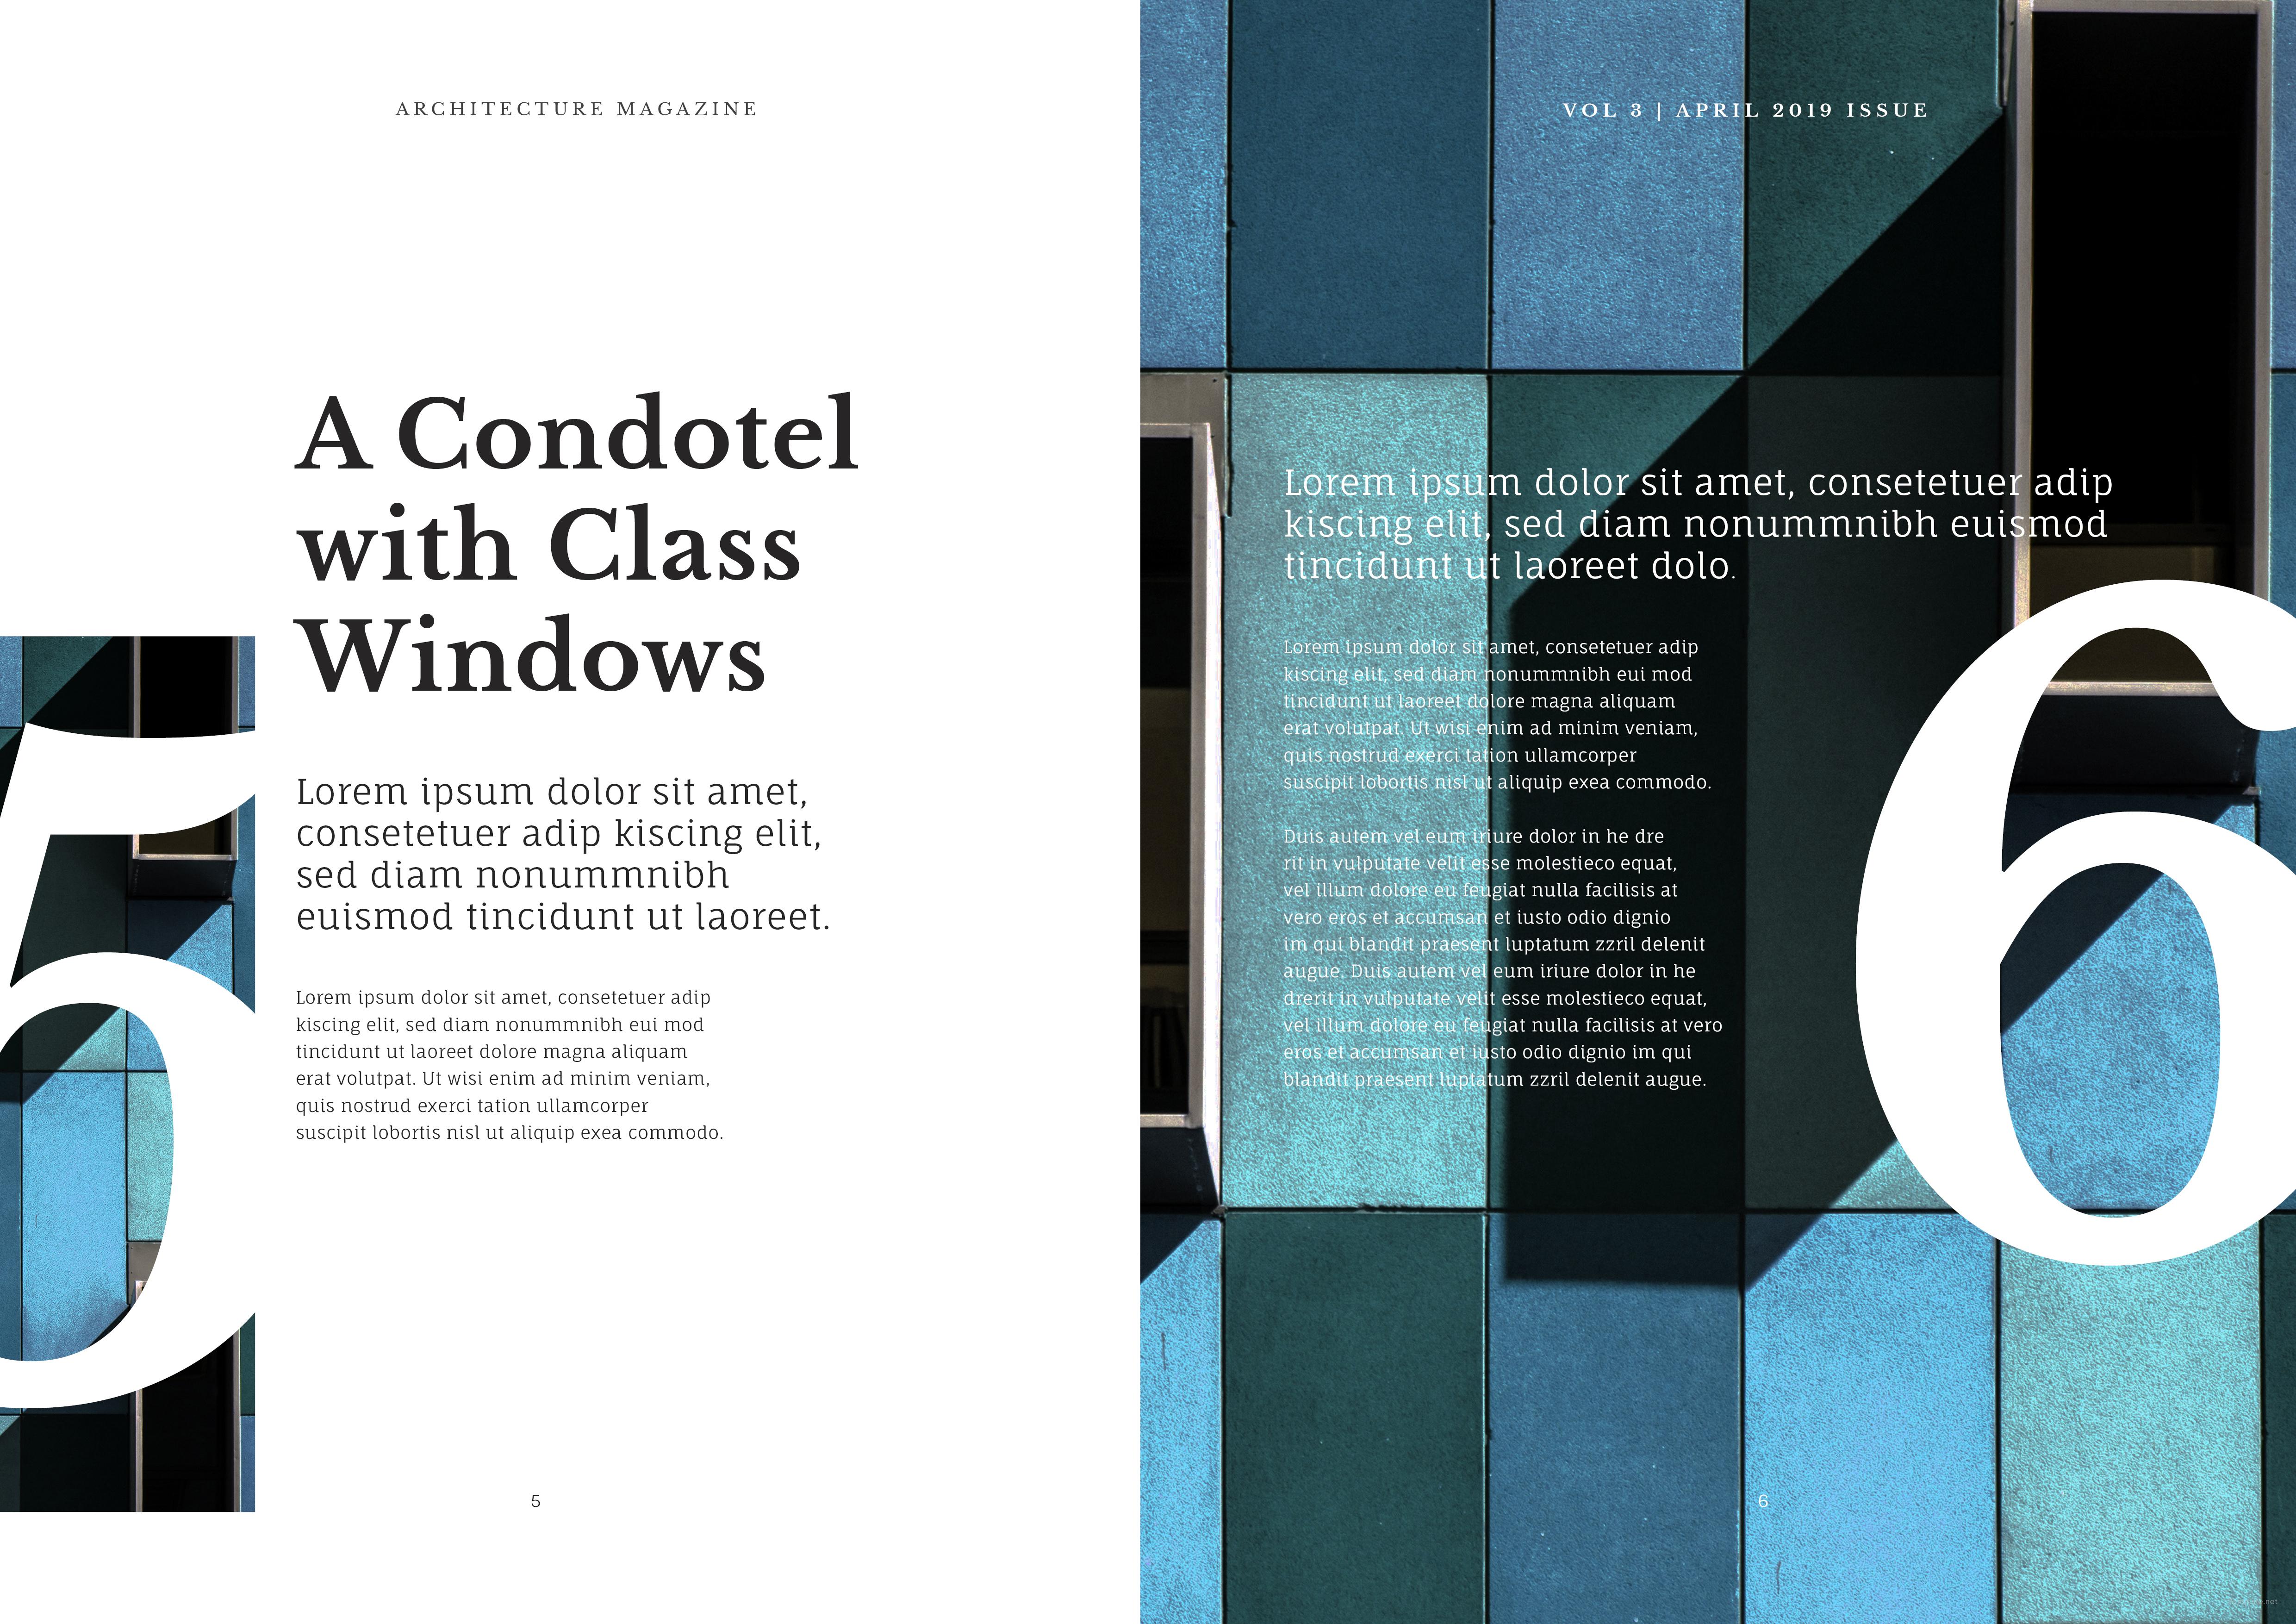 Customize Architecture Magazine Template